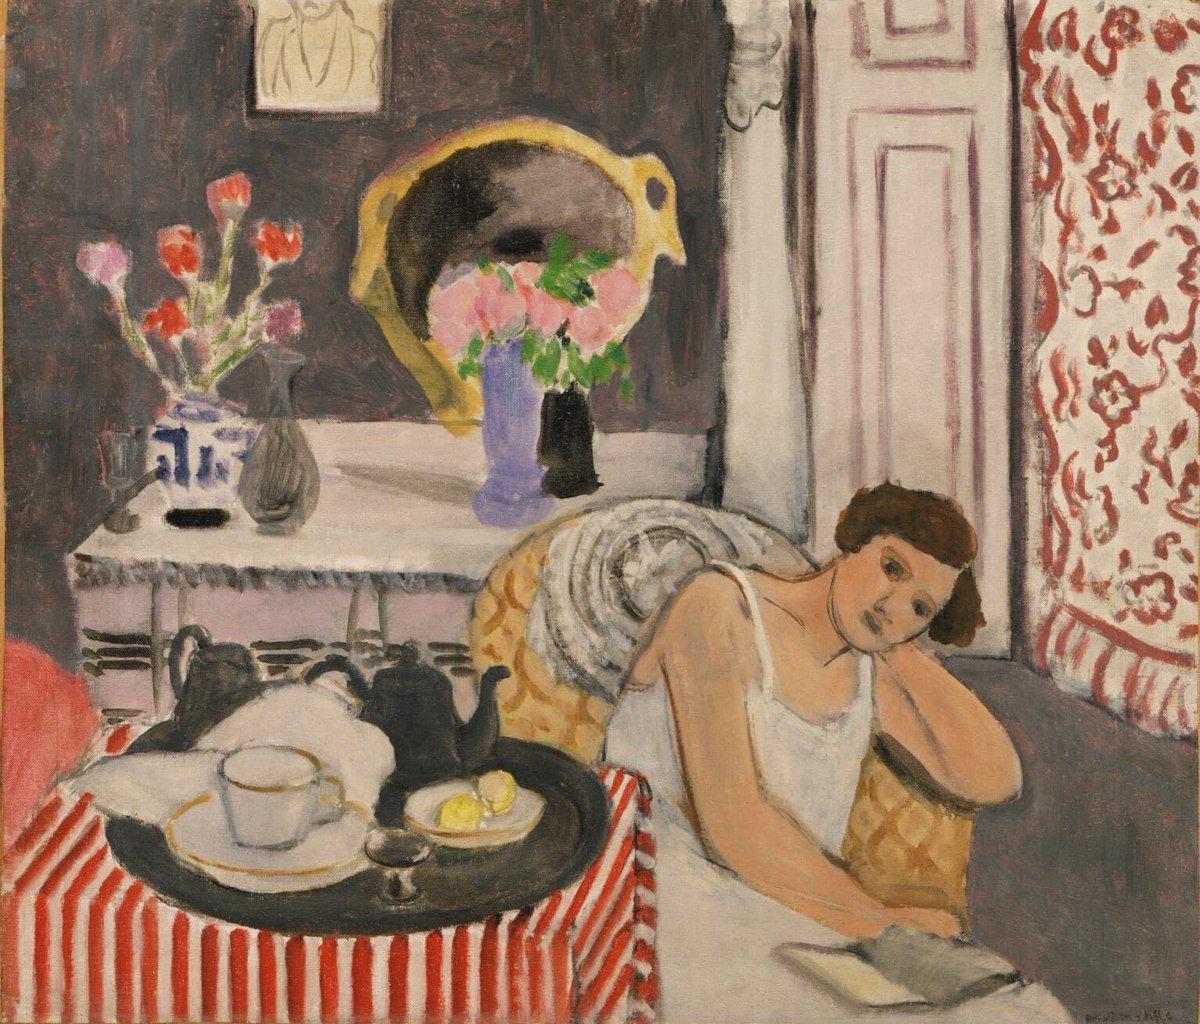 Henri Matisse Breakfast, 1920 #henrimatisse #matisse #french #breakfast #woman #fauvism #fauvist #modernism #art #artgallery #artinfinitus #italy #paris #france #impressionism #postimpressionism #classicalrealism #portraitpainting #stilllife  #beautiful #kunst #interieur #foodpic.twitter.com/L5Eyy9Q3qH